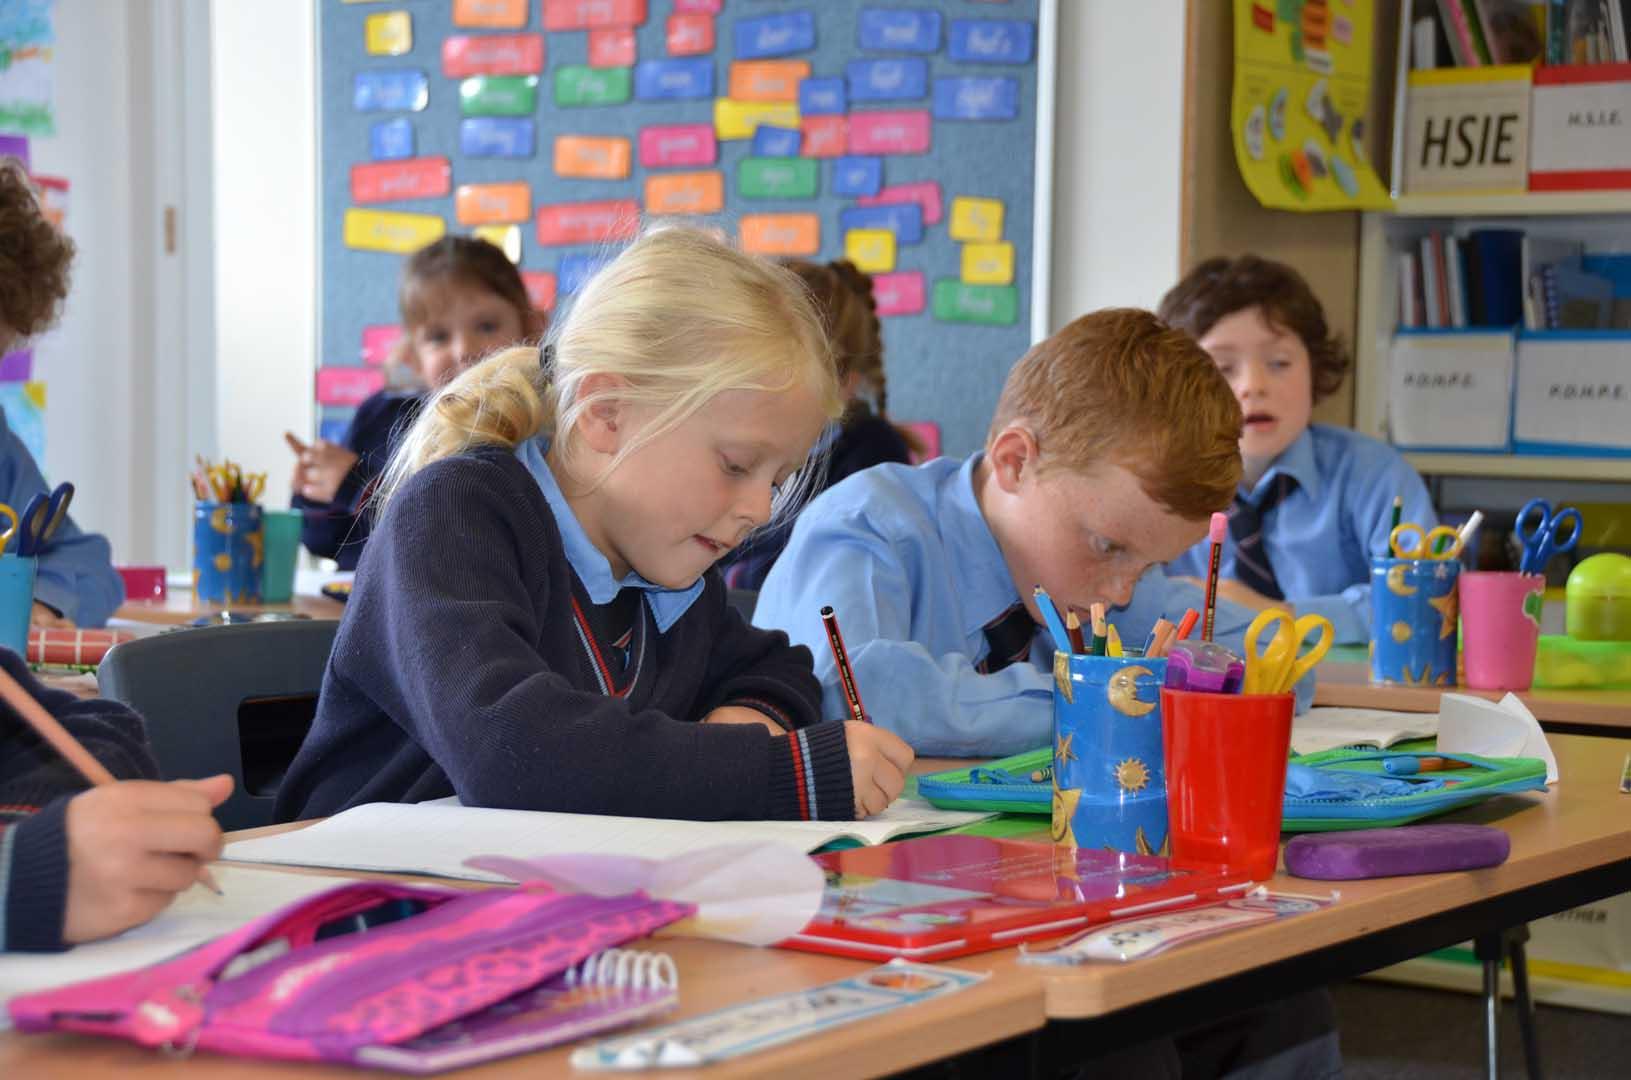 St-Patricks-walcha-classroom456